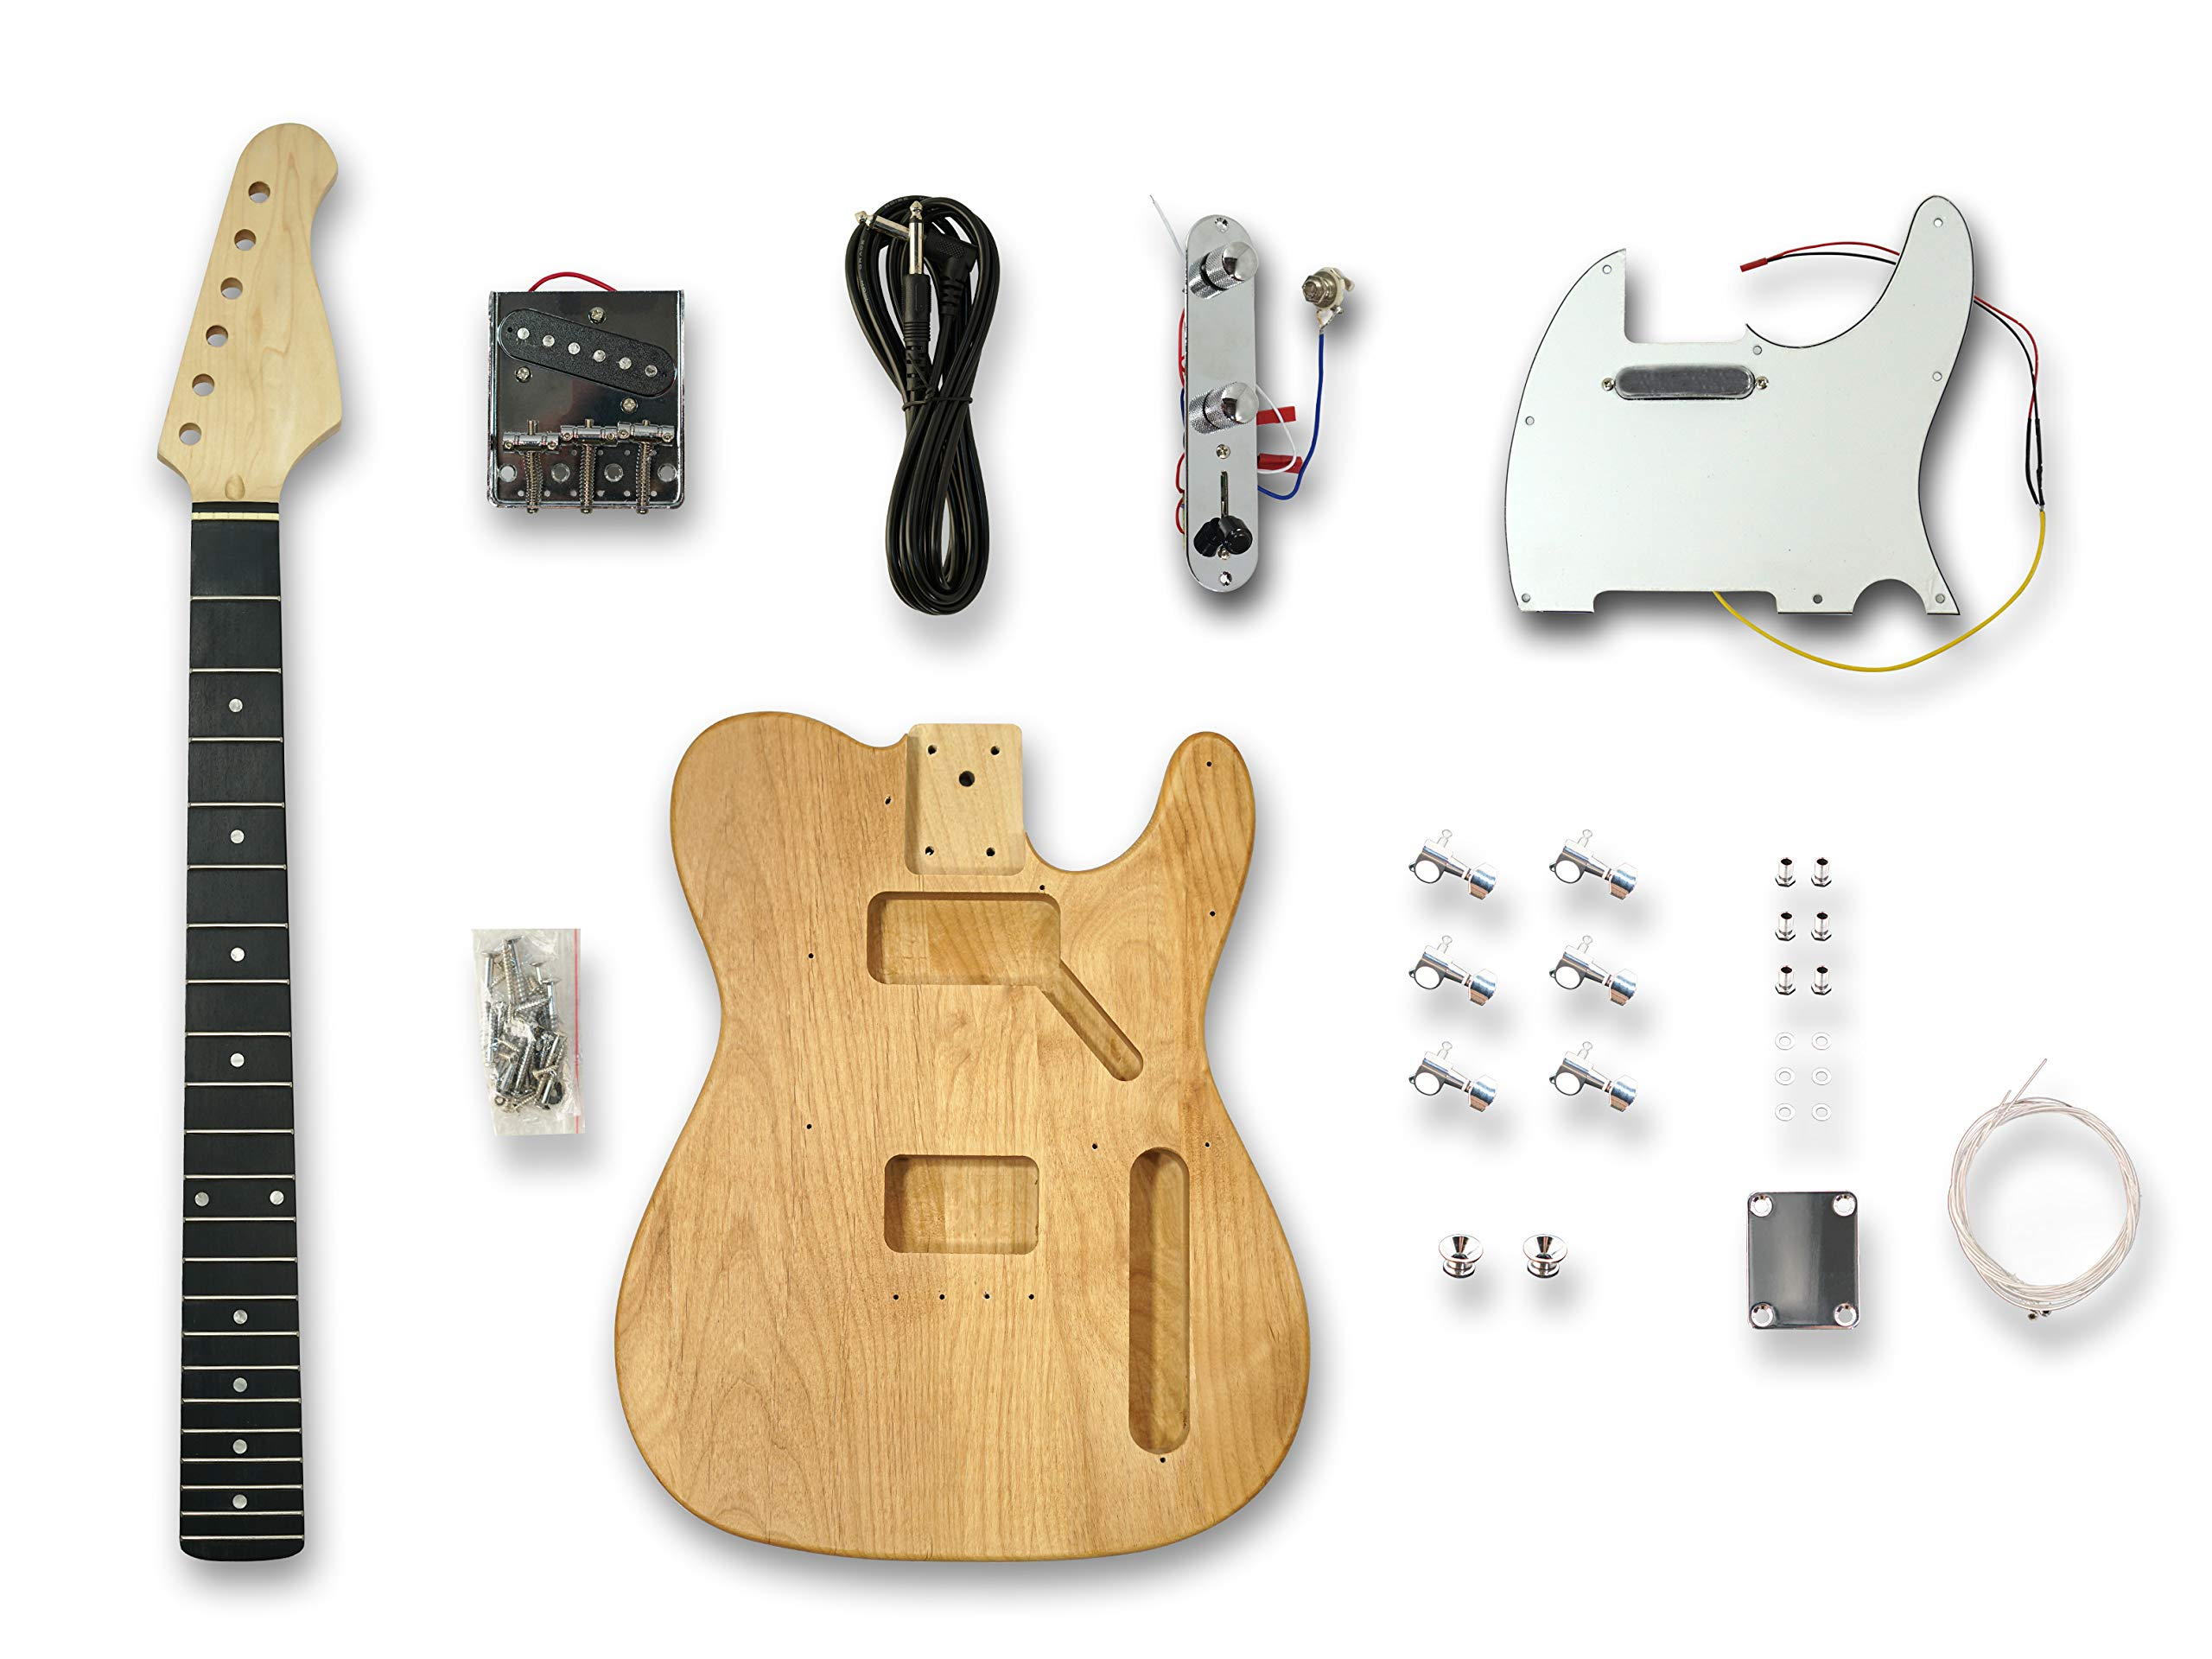 DIY Electric Guitar Kits for Telecaster Style Guitar, American Alder Body